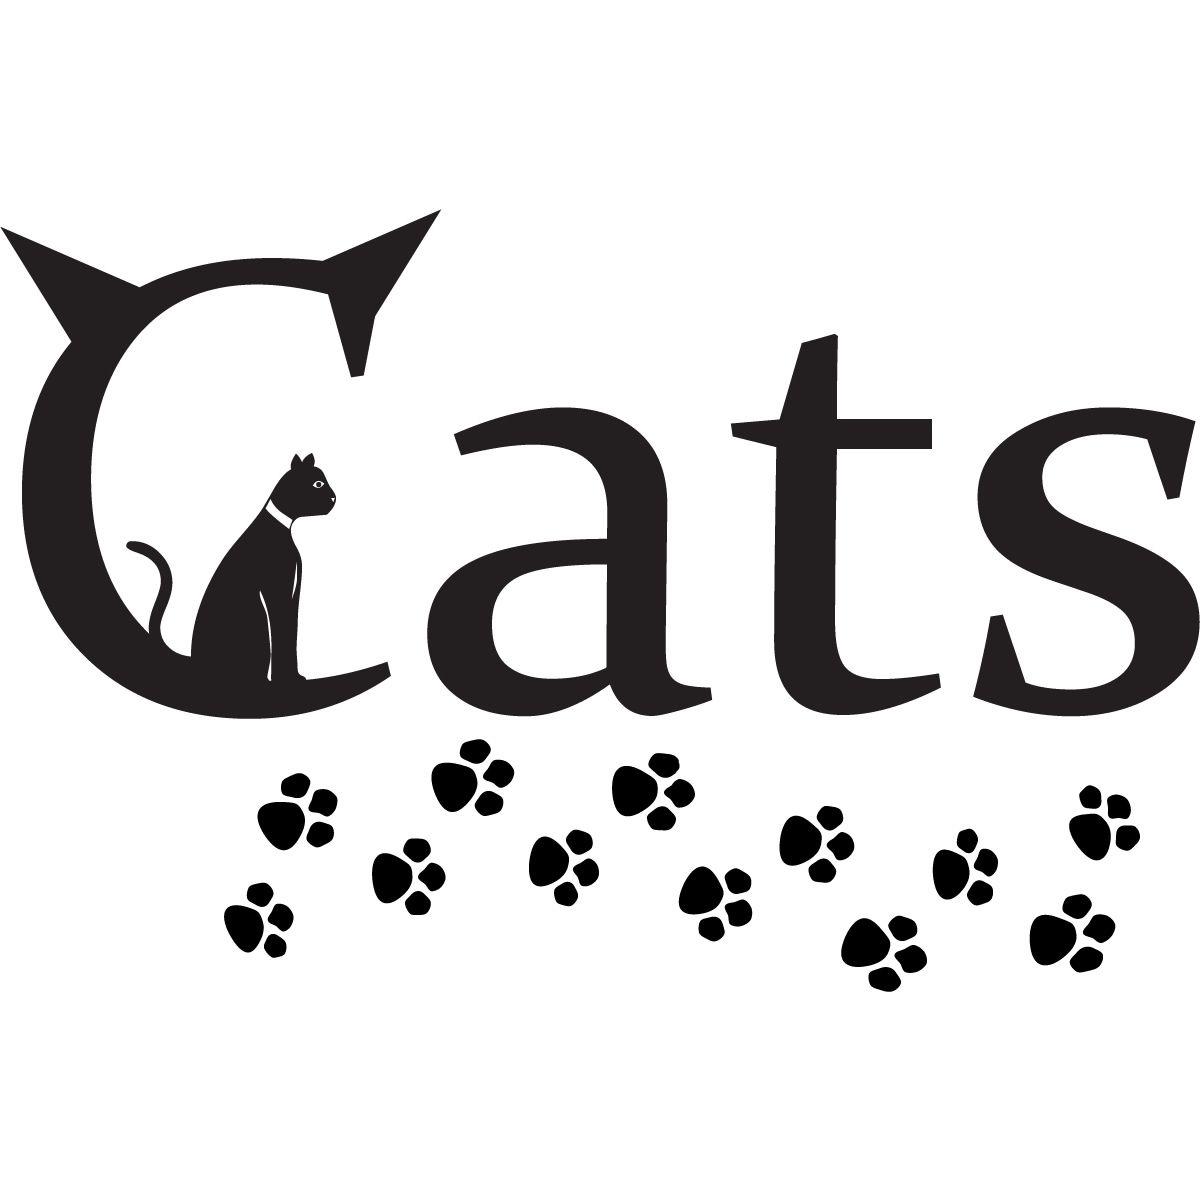 Paws Animal Print Prints Animals Cat Paw